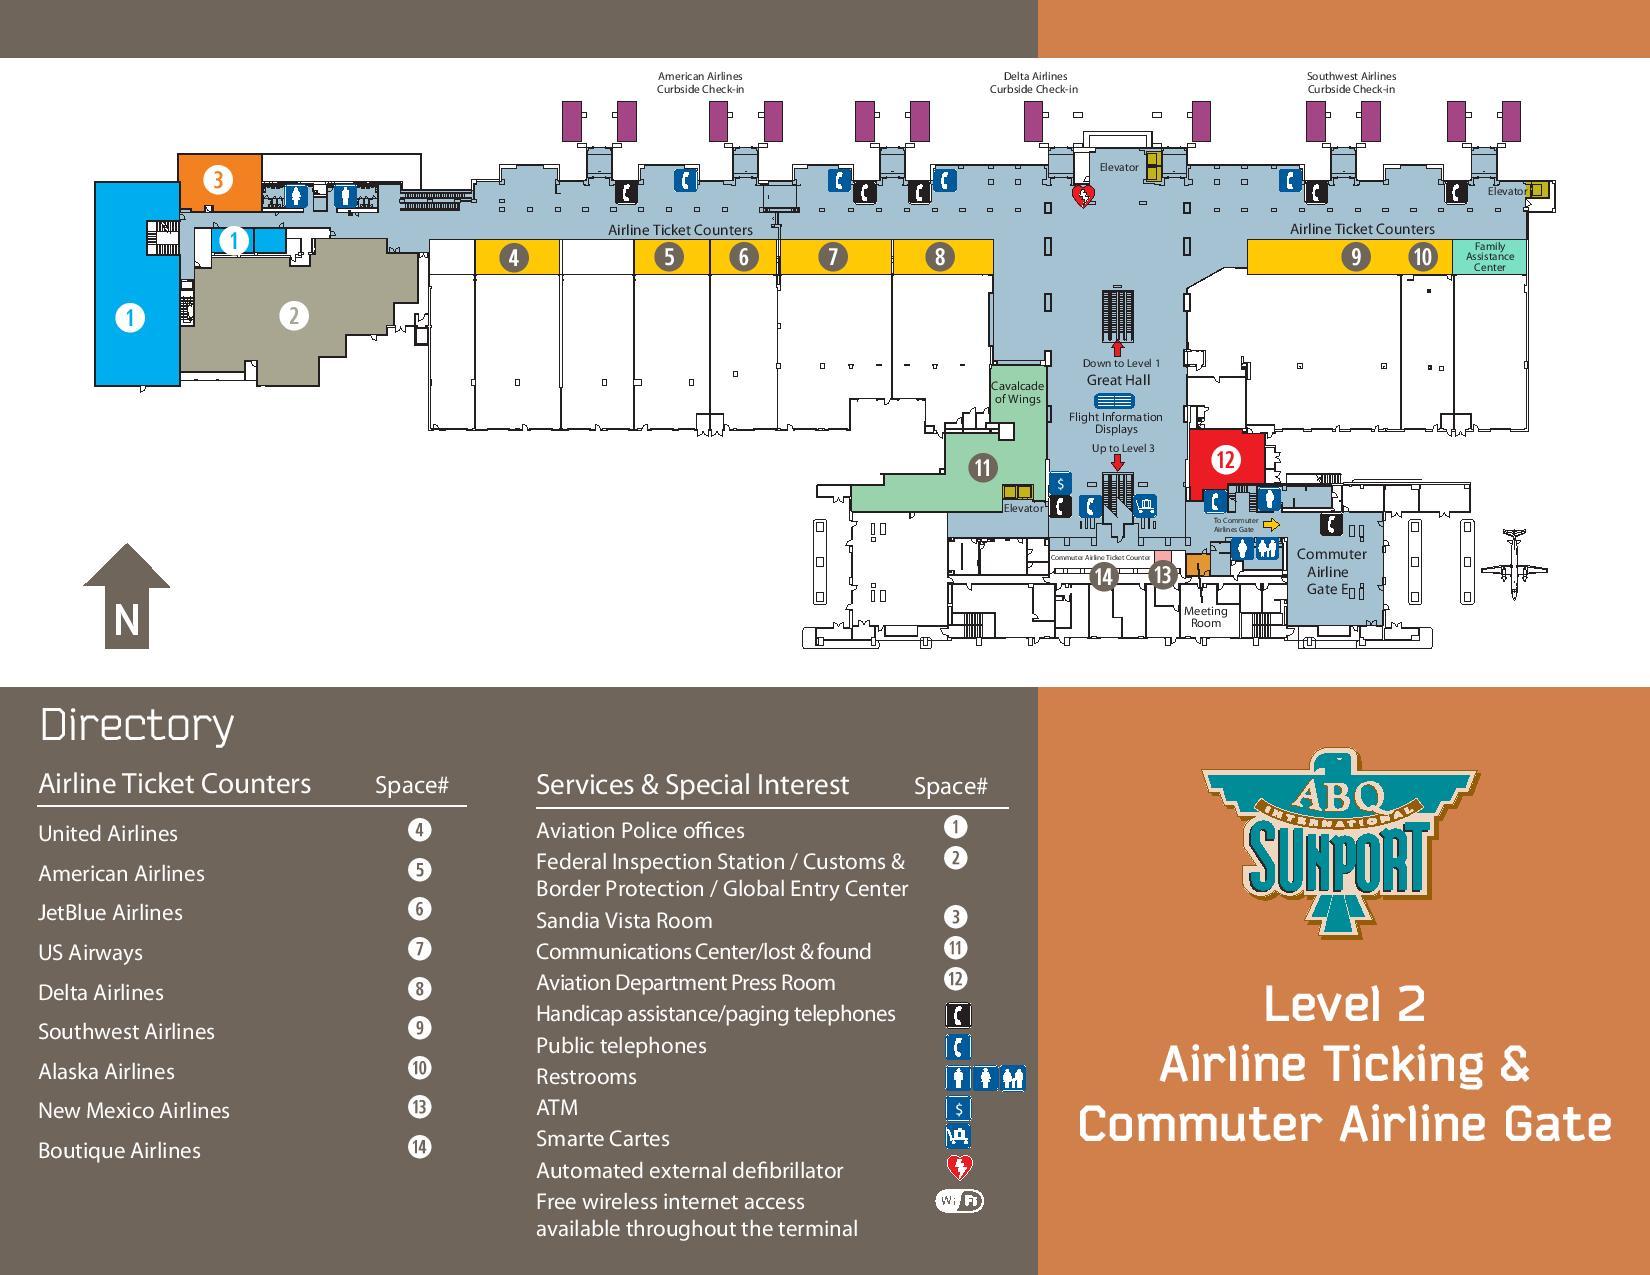 Advantage Car Rental Abq Airport